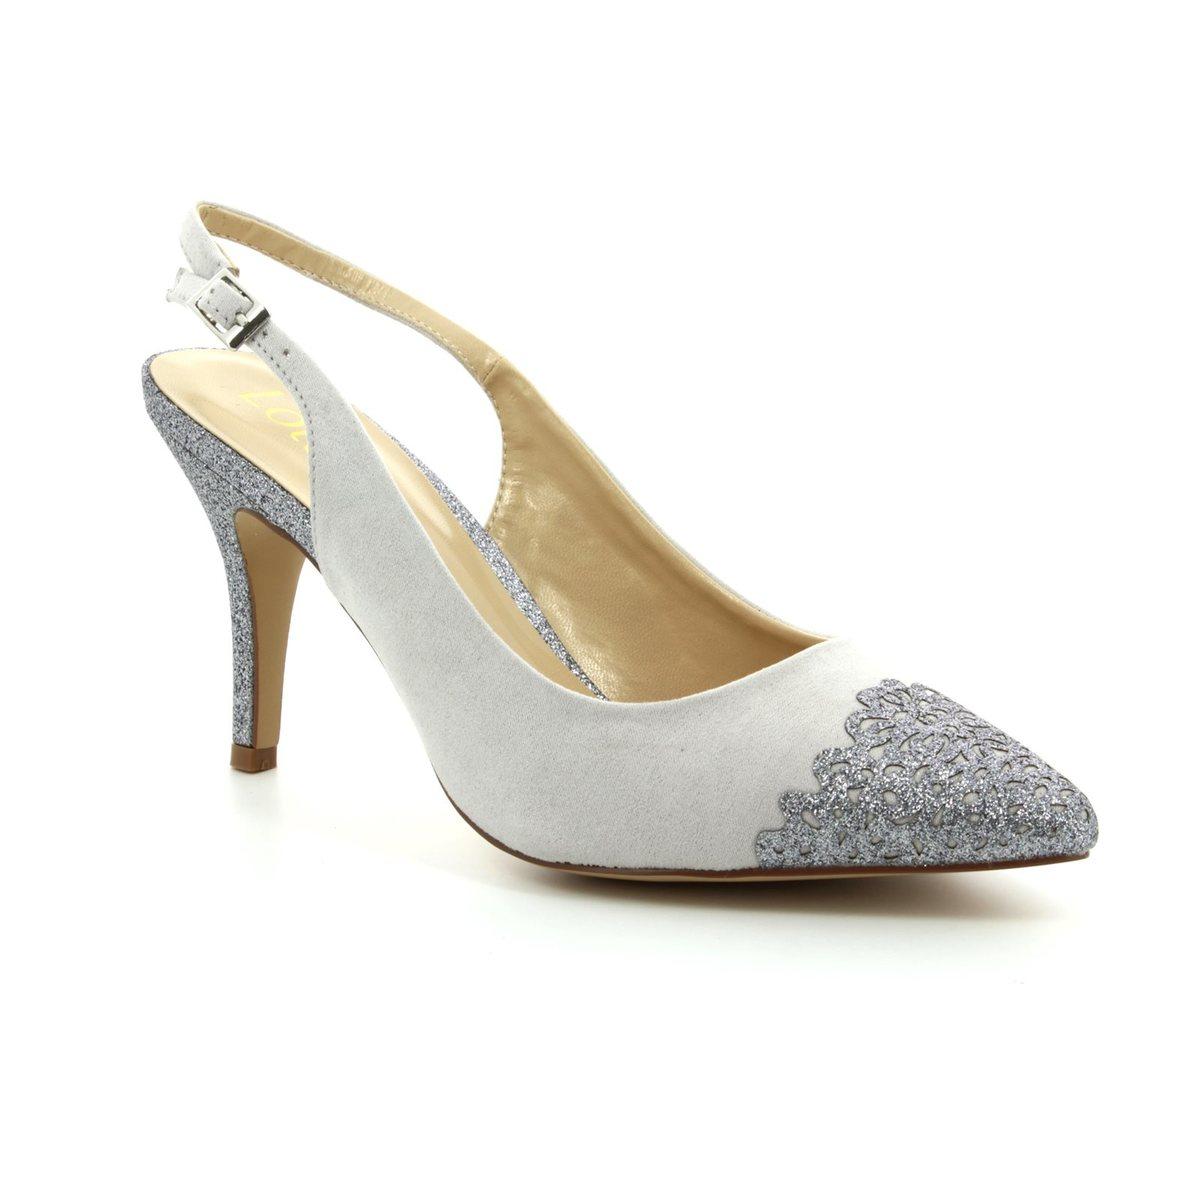 7b75dd346b Lotus High-heeled Shoes - Grey muti - 50796/00 ARLIND